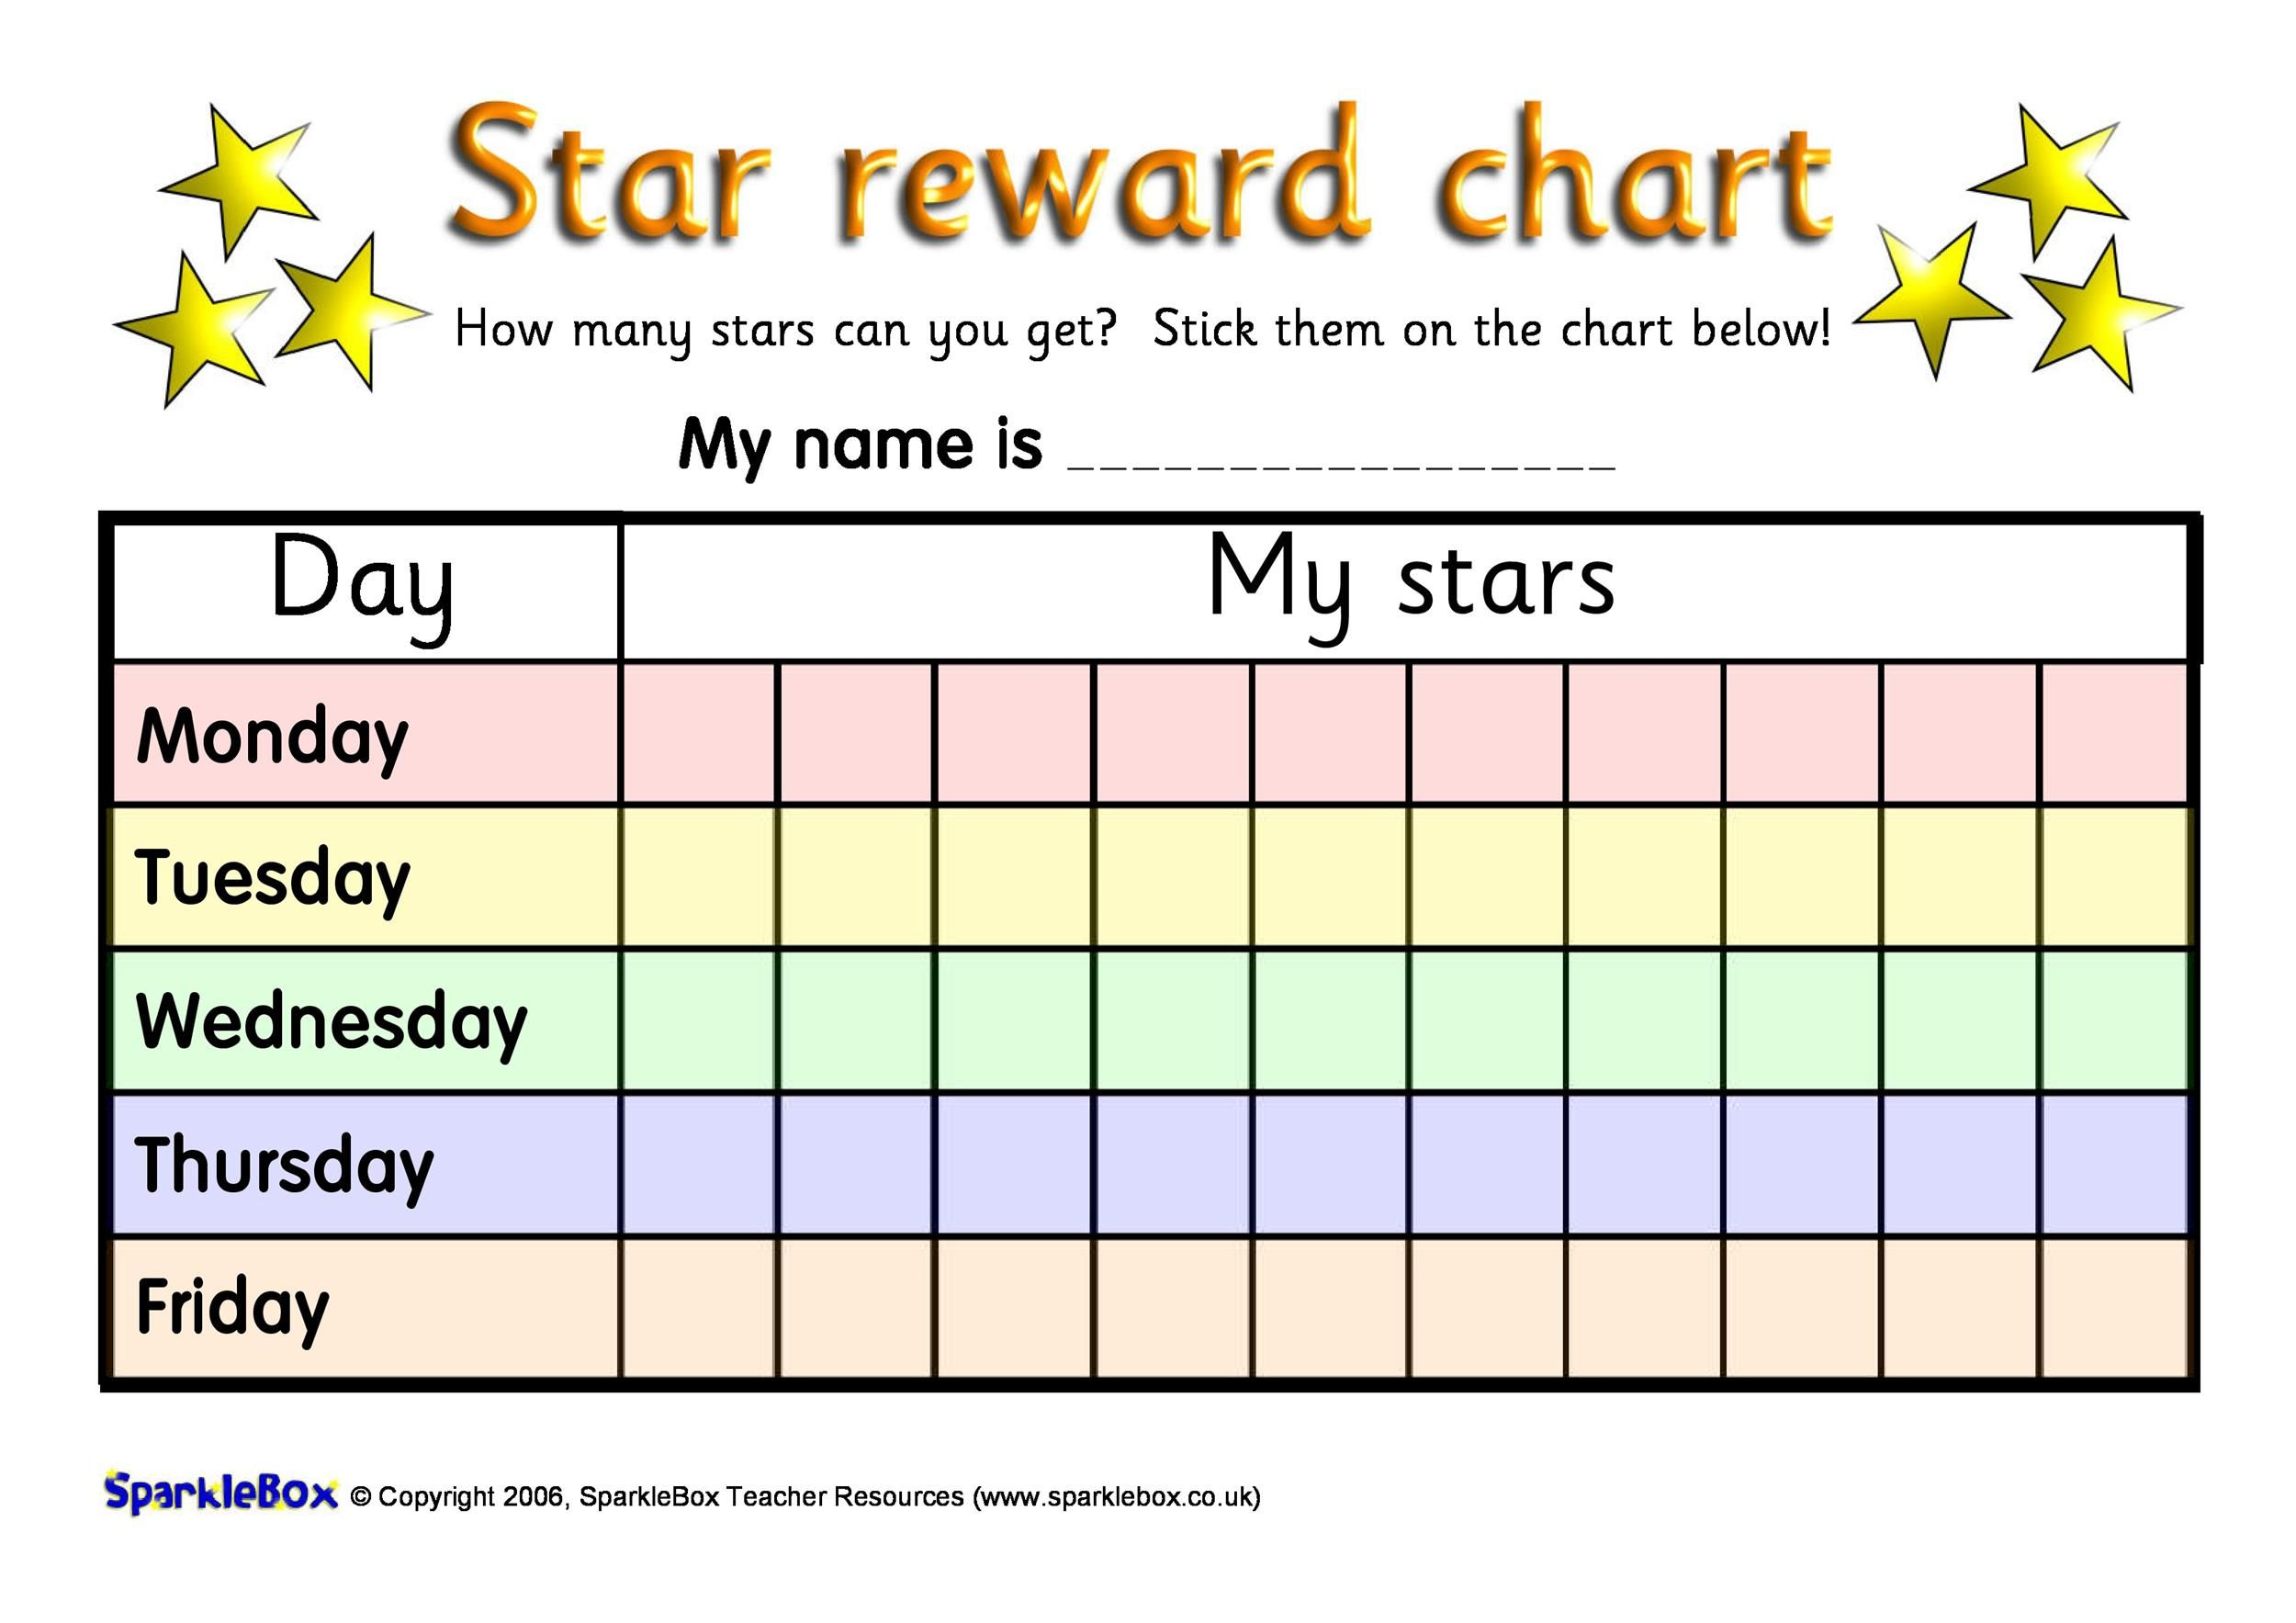 44 Printable Reward Charts For Kids Excel Word In 2020 Printable Reward Charts Reward Chart Incentive Chart [ 1767 x 2500 Pixel ]